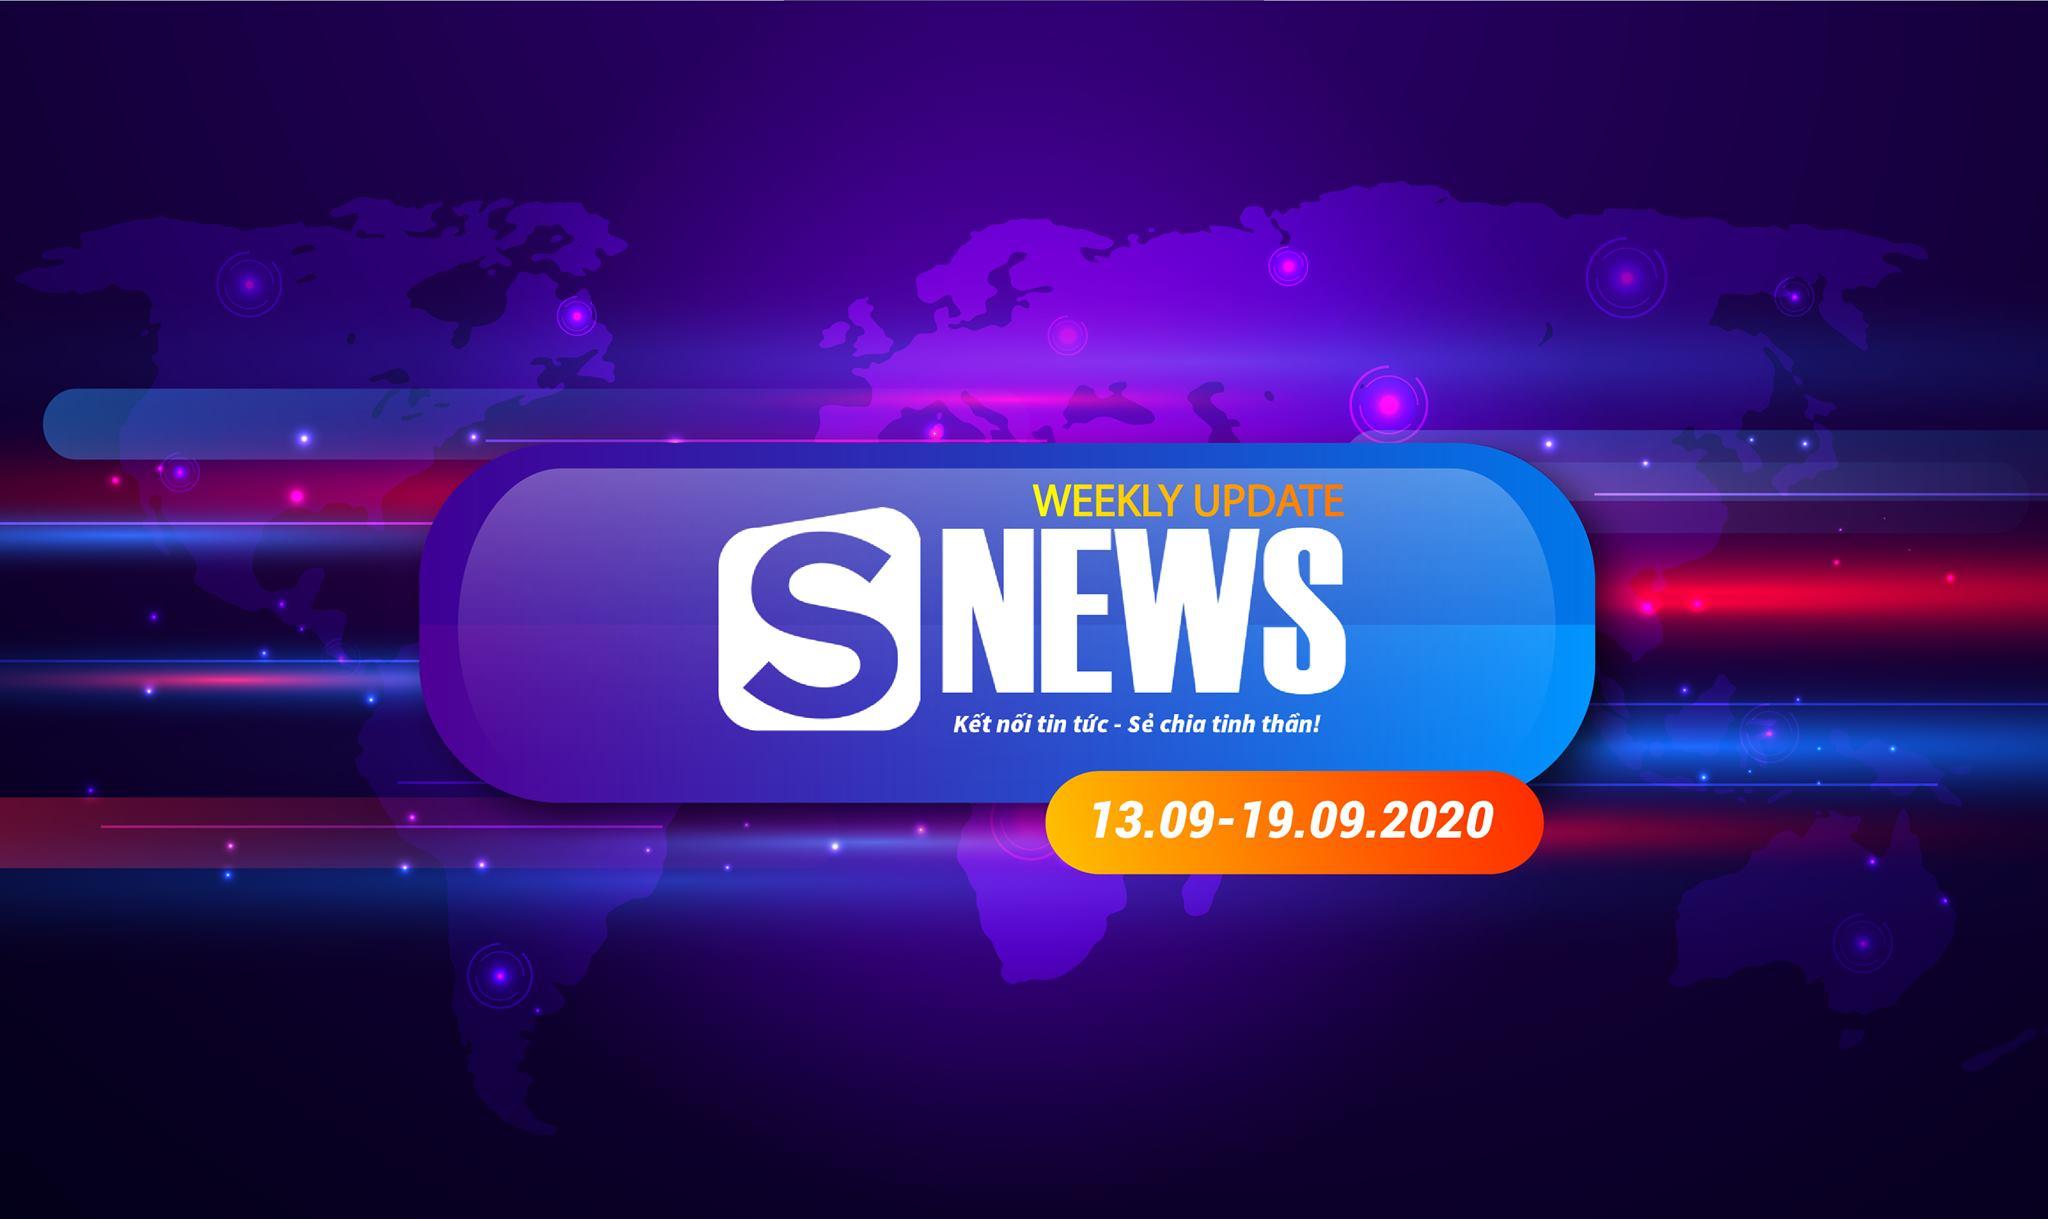 Tổng hợp tin tức Sapo tuần qua: 13.09 - 19.09